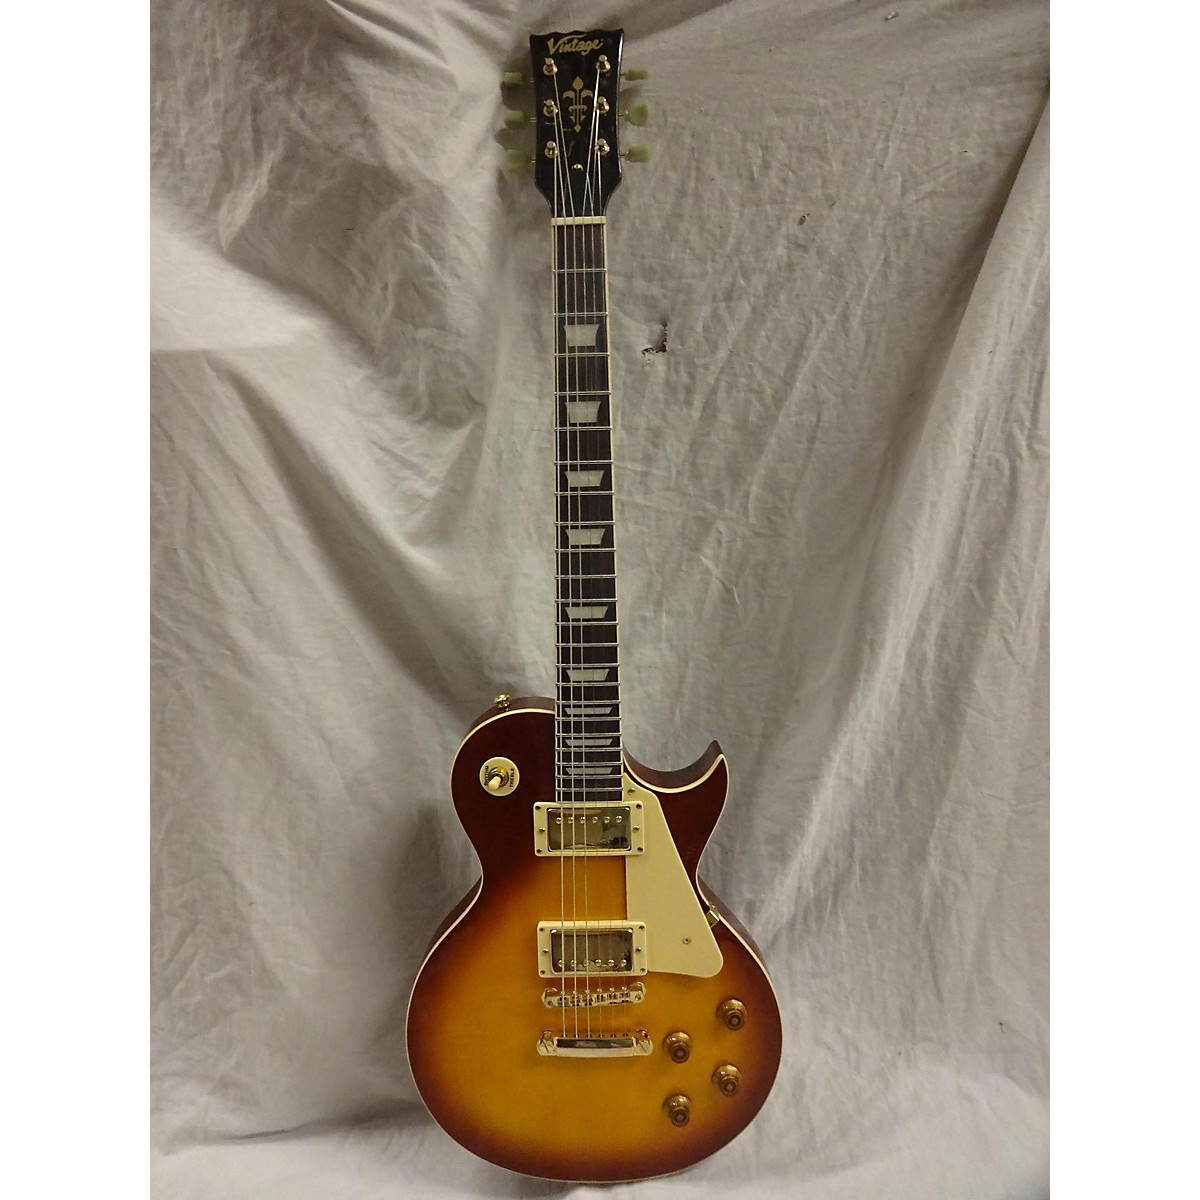 Vintage VP100 Solid Body Electric Guitar